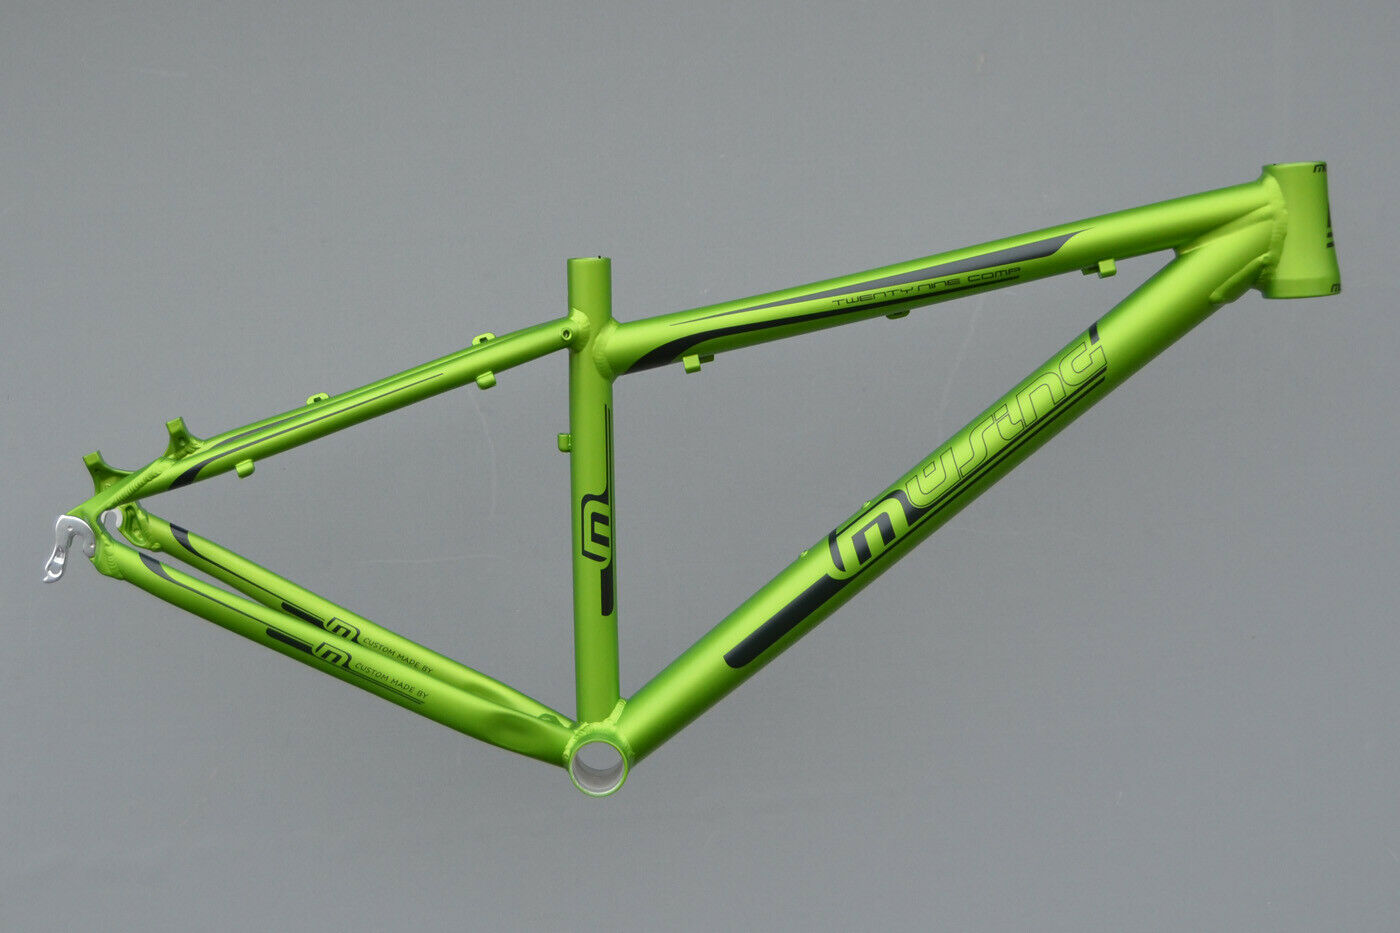 Müsing Twenty Nine Comp Mountainbike Rahmen RH 40 cm in grün metallic 29  NR522